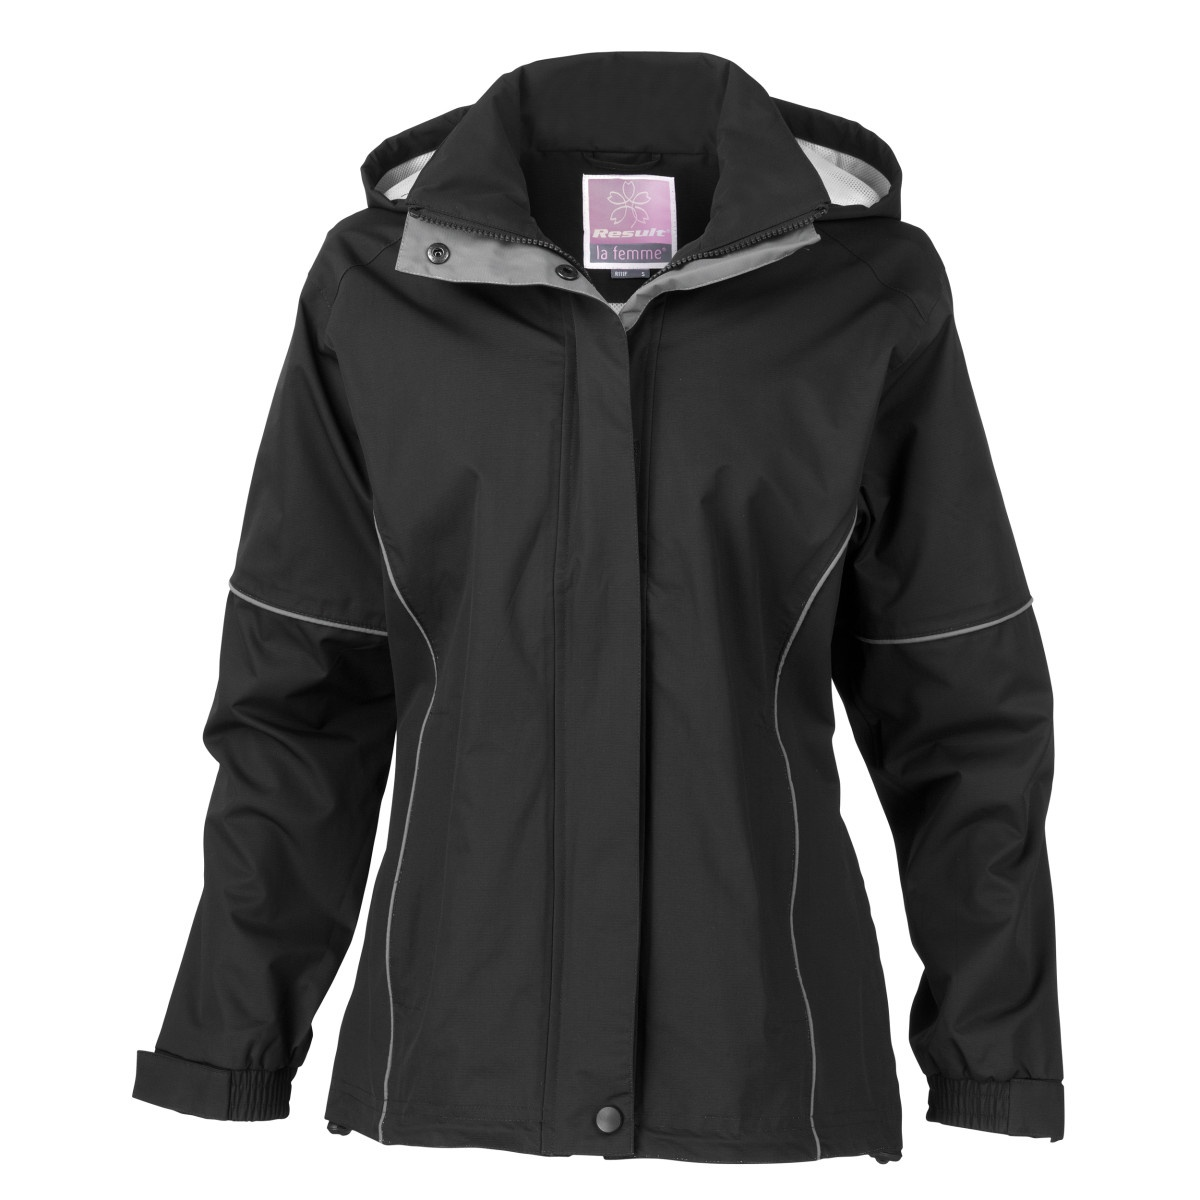 Result Womens/Ladies Urban Fell Lightweight Technical Jacket (Waterproof & Windproof) (XL) (Black)